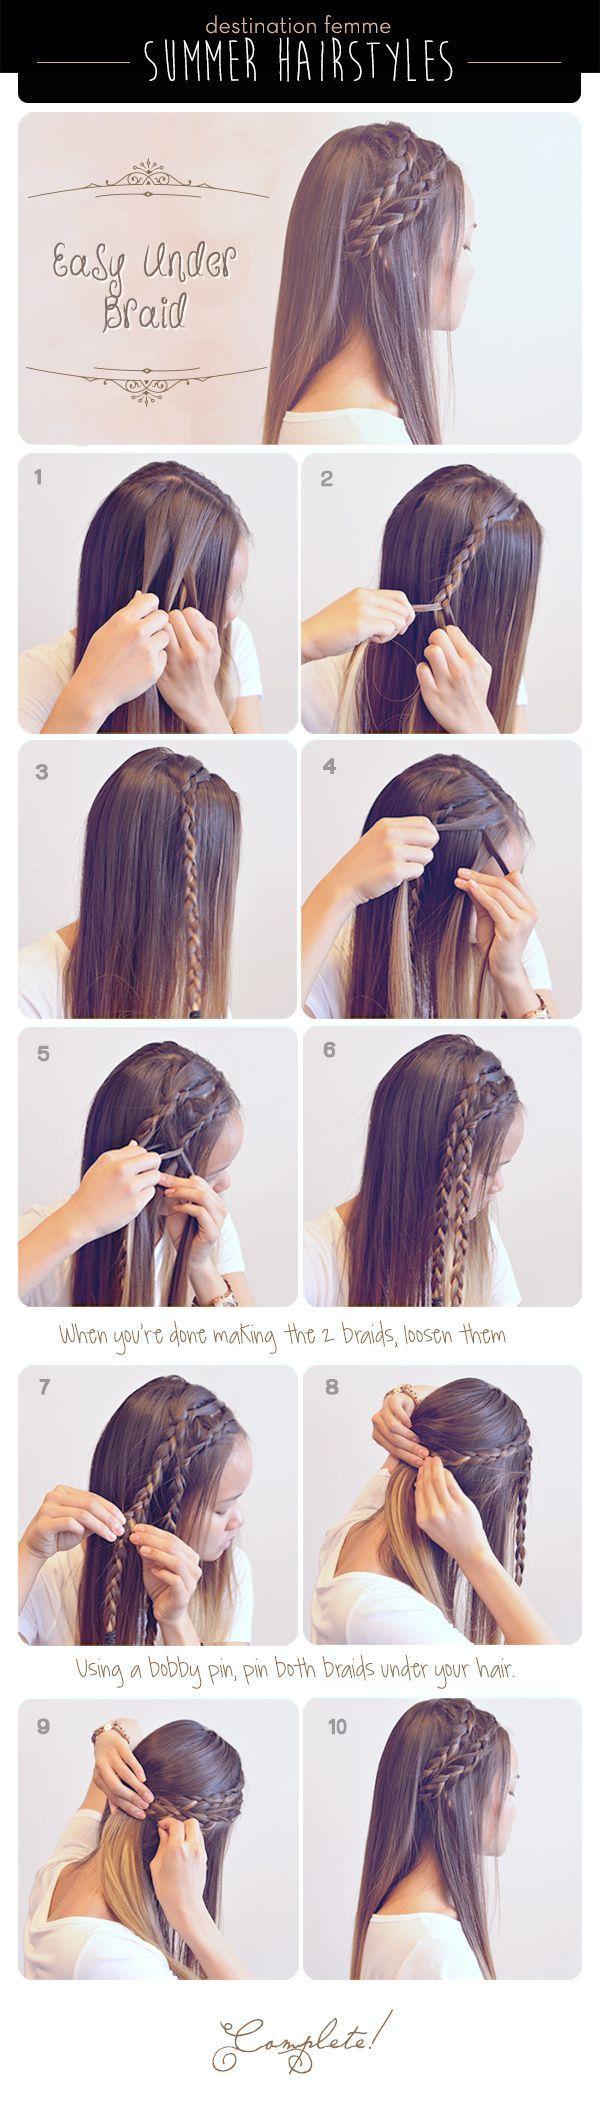 3 Cute & Easy Braided Hairdos For Summer  Destination Femme